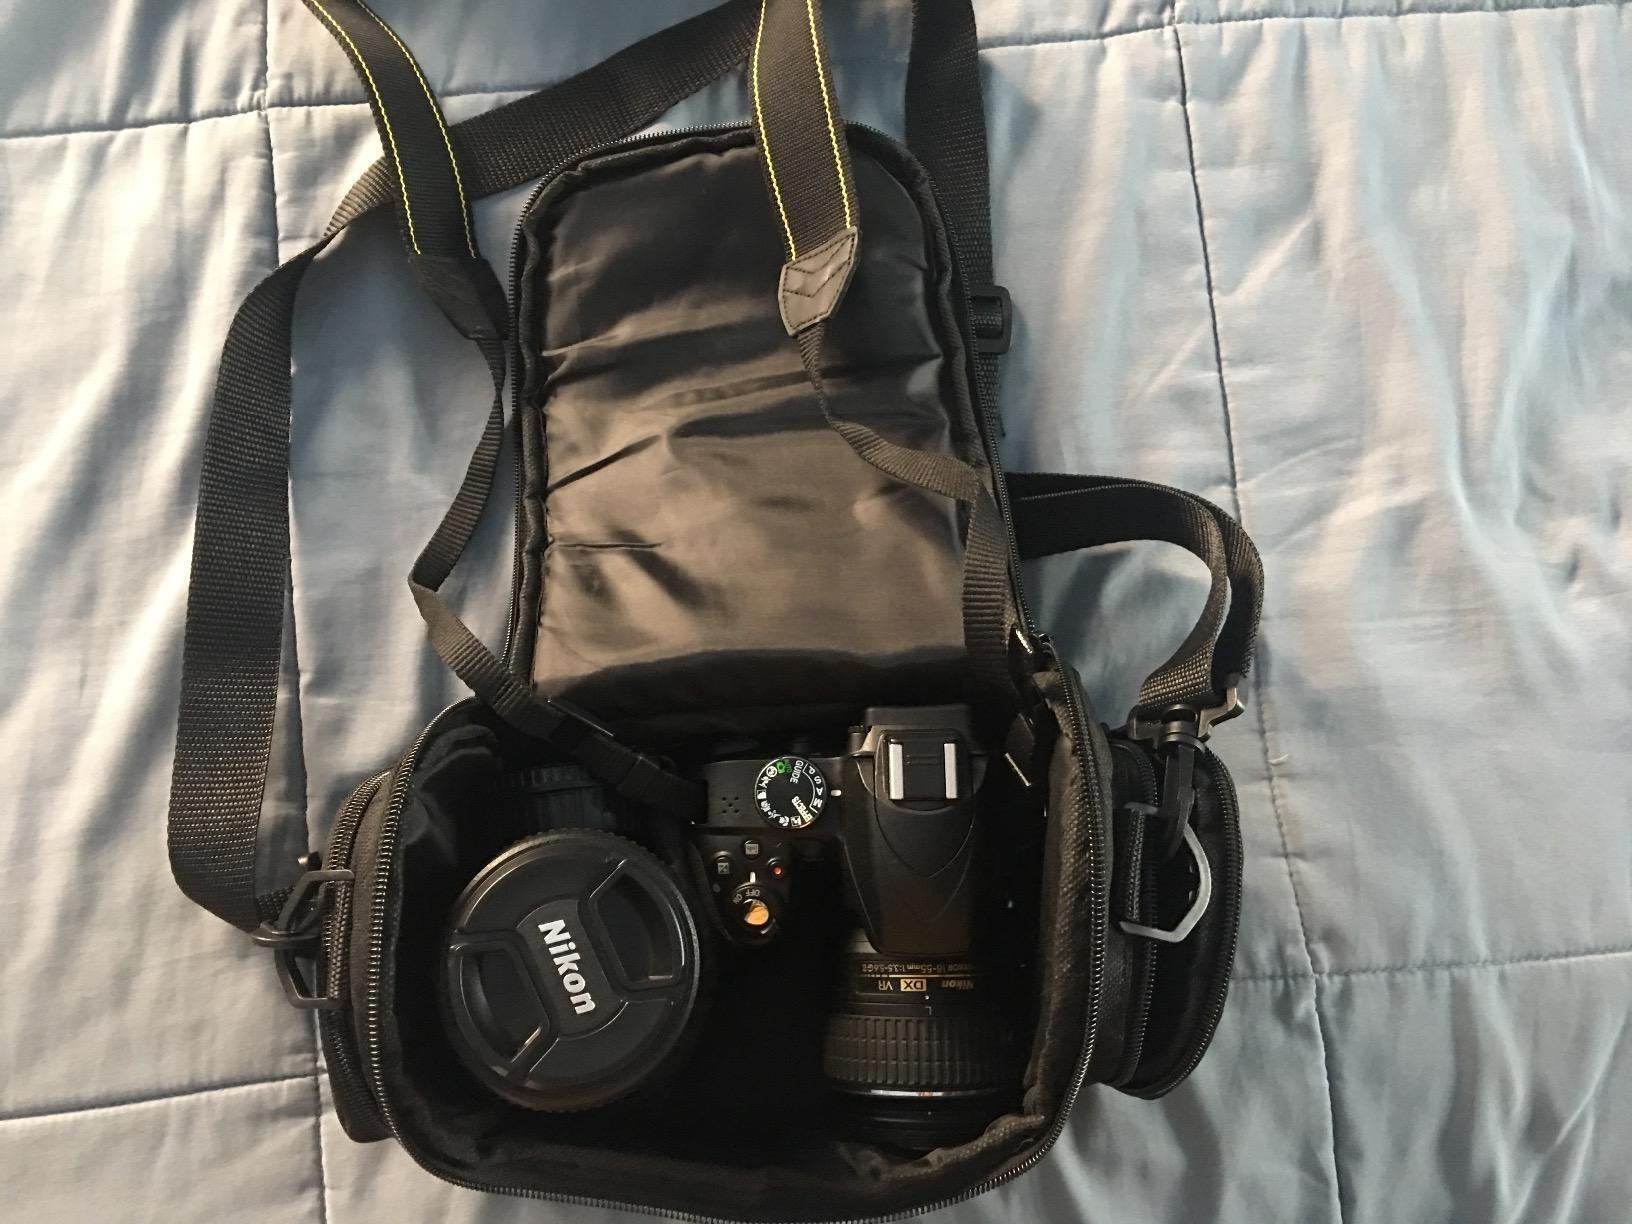 reviewer's camera bag with a camera and extra lens inside